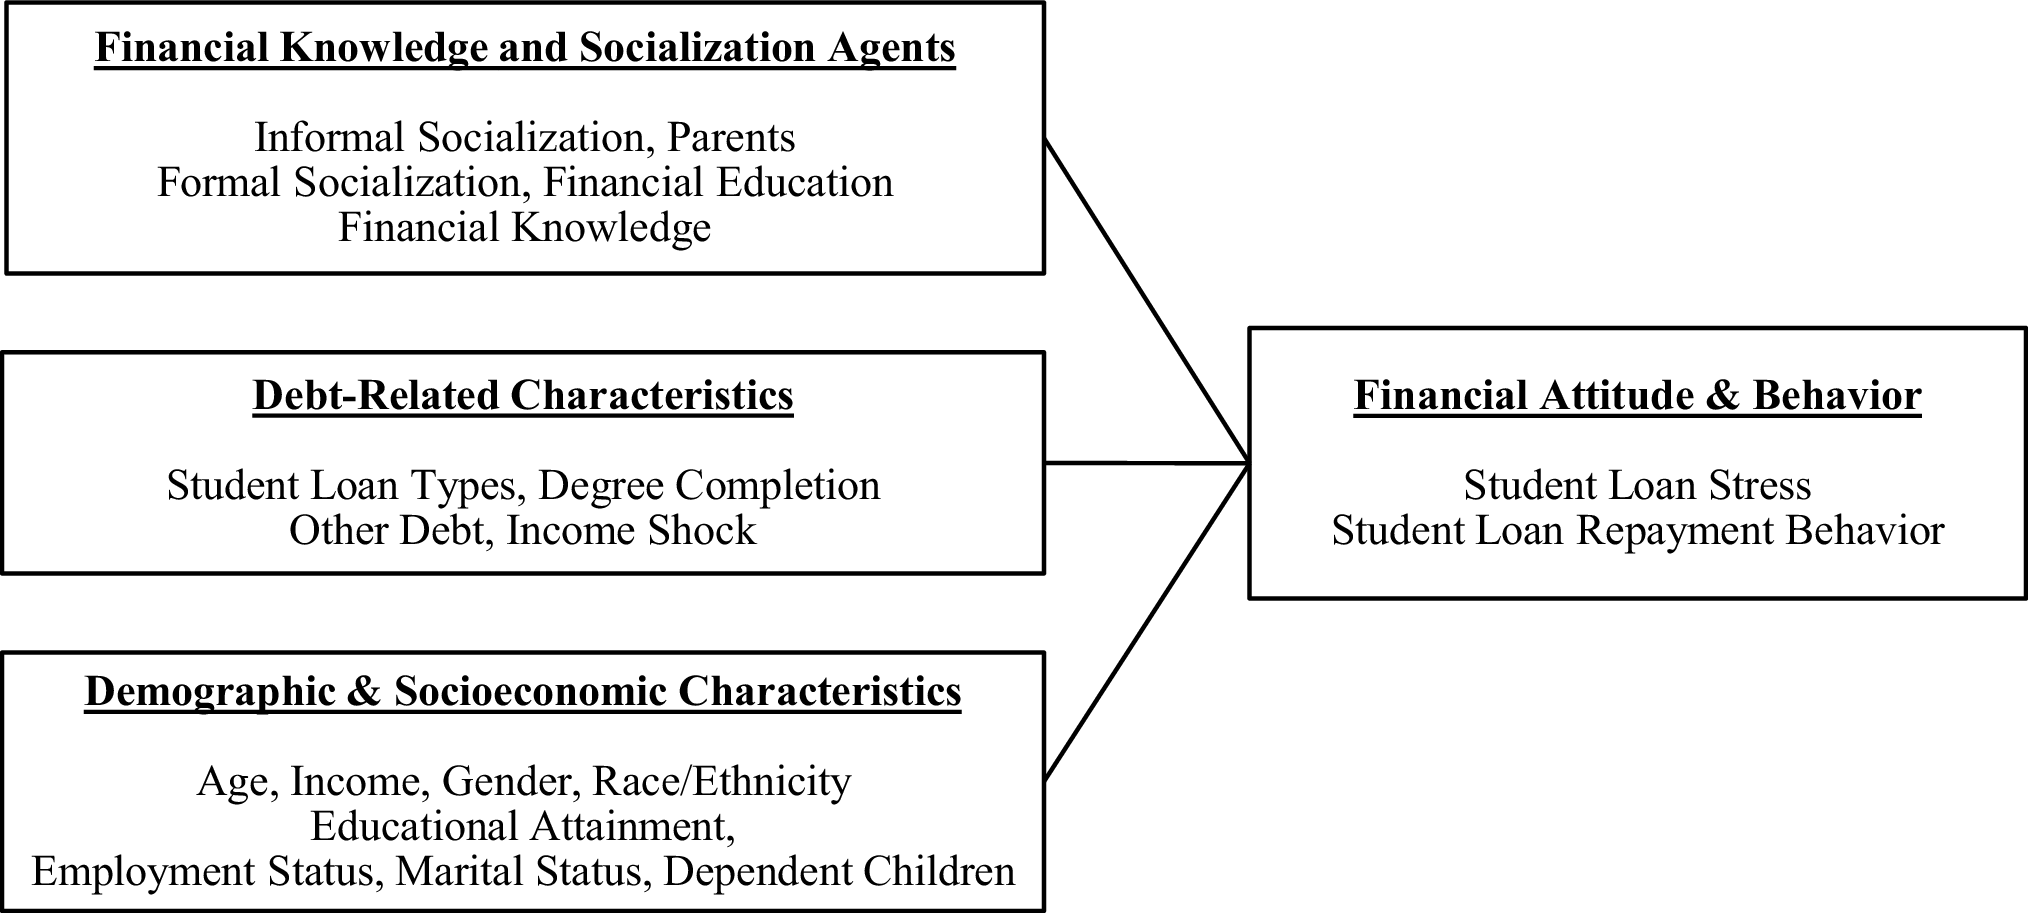 formal agents of socialization